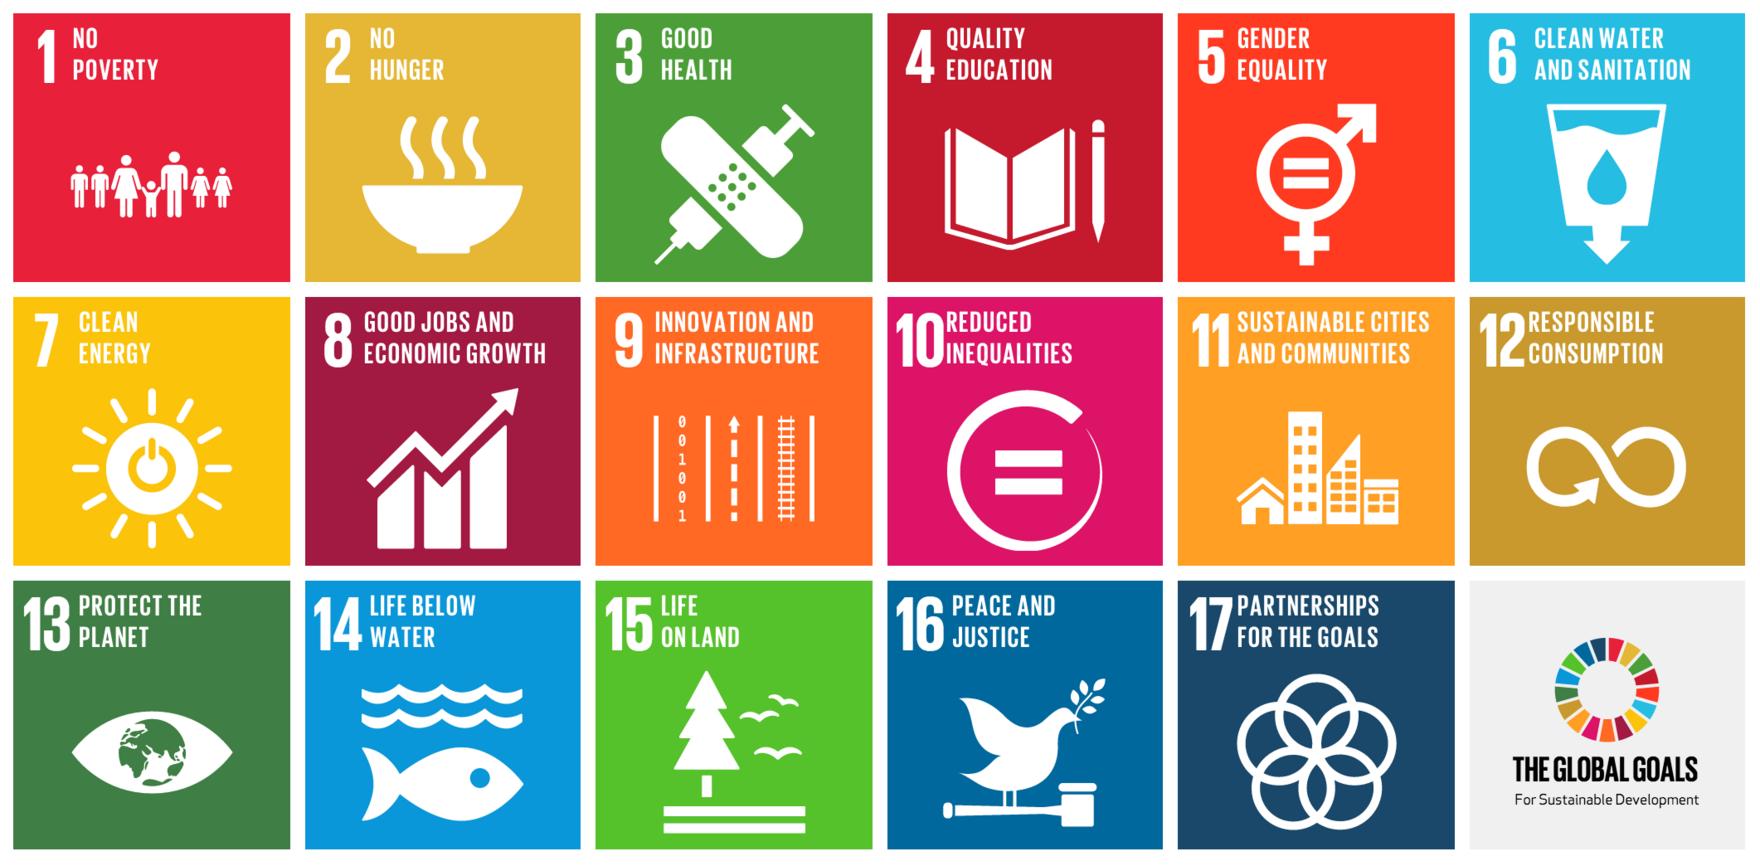 Explorer's Hub > the globala challenges > Global Goals 2030